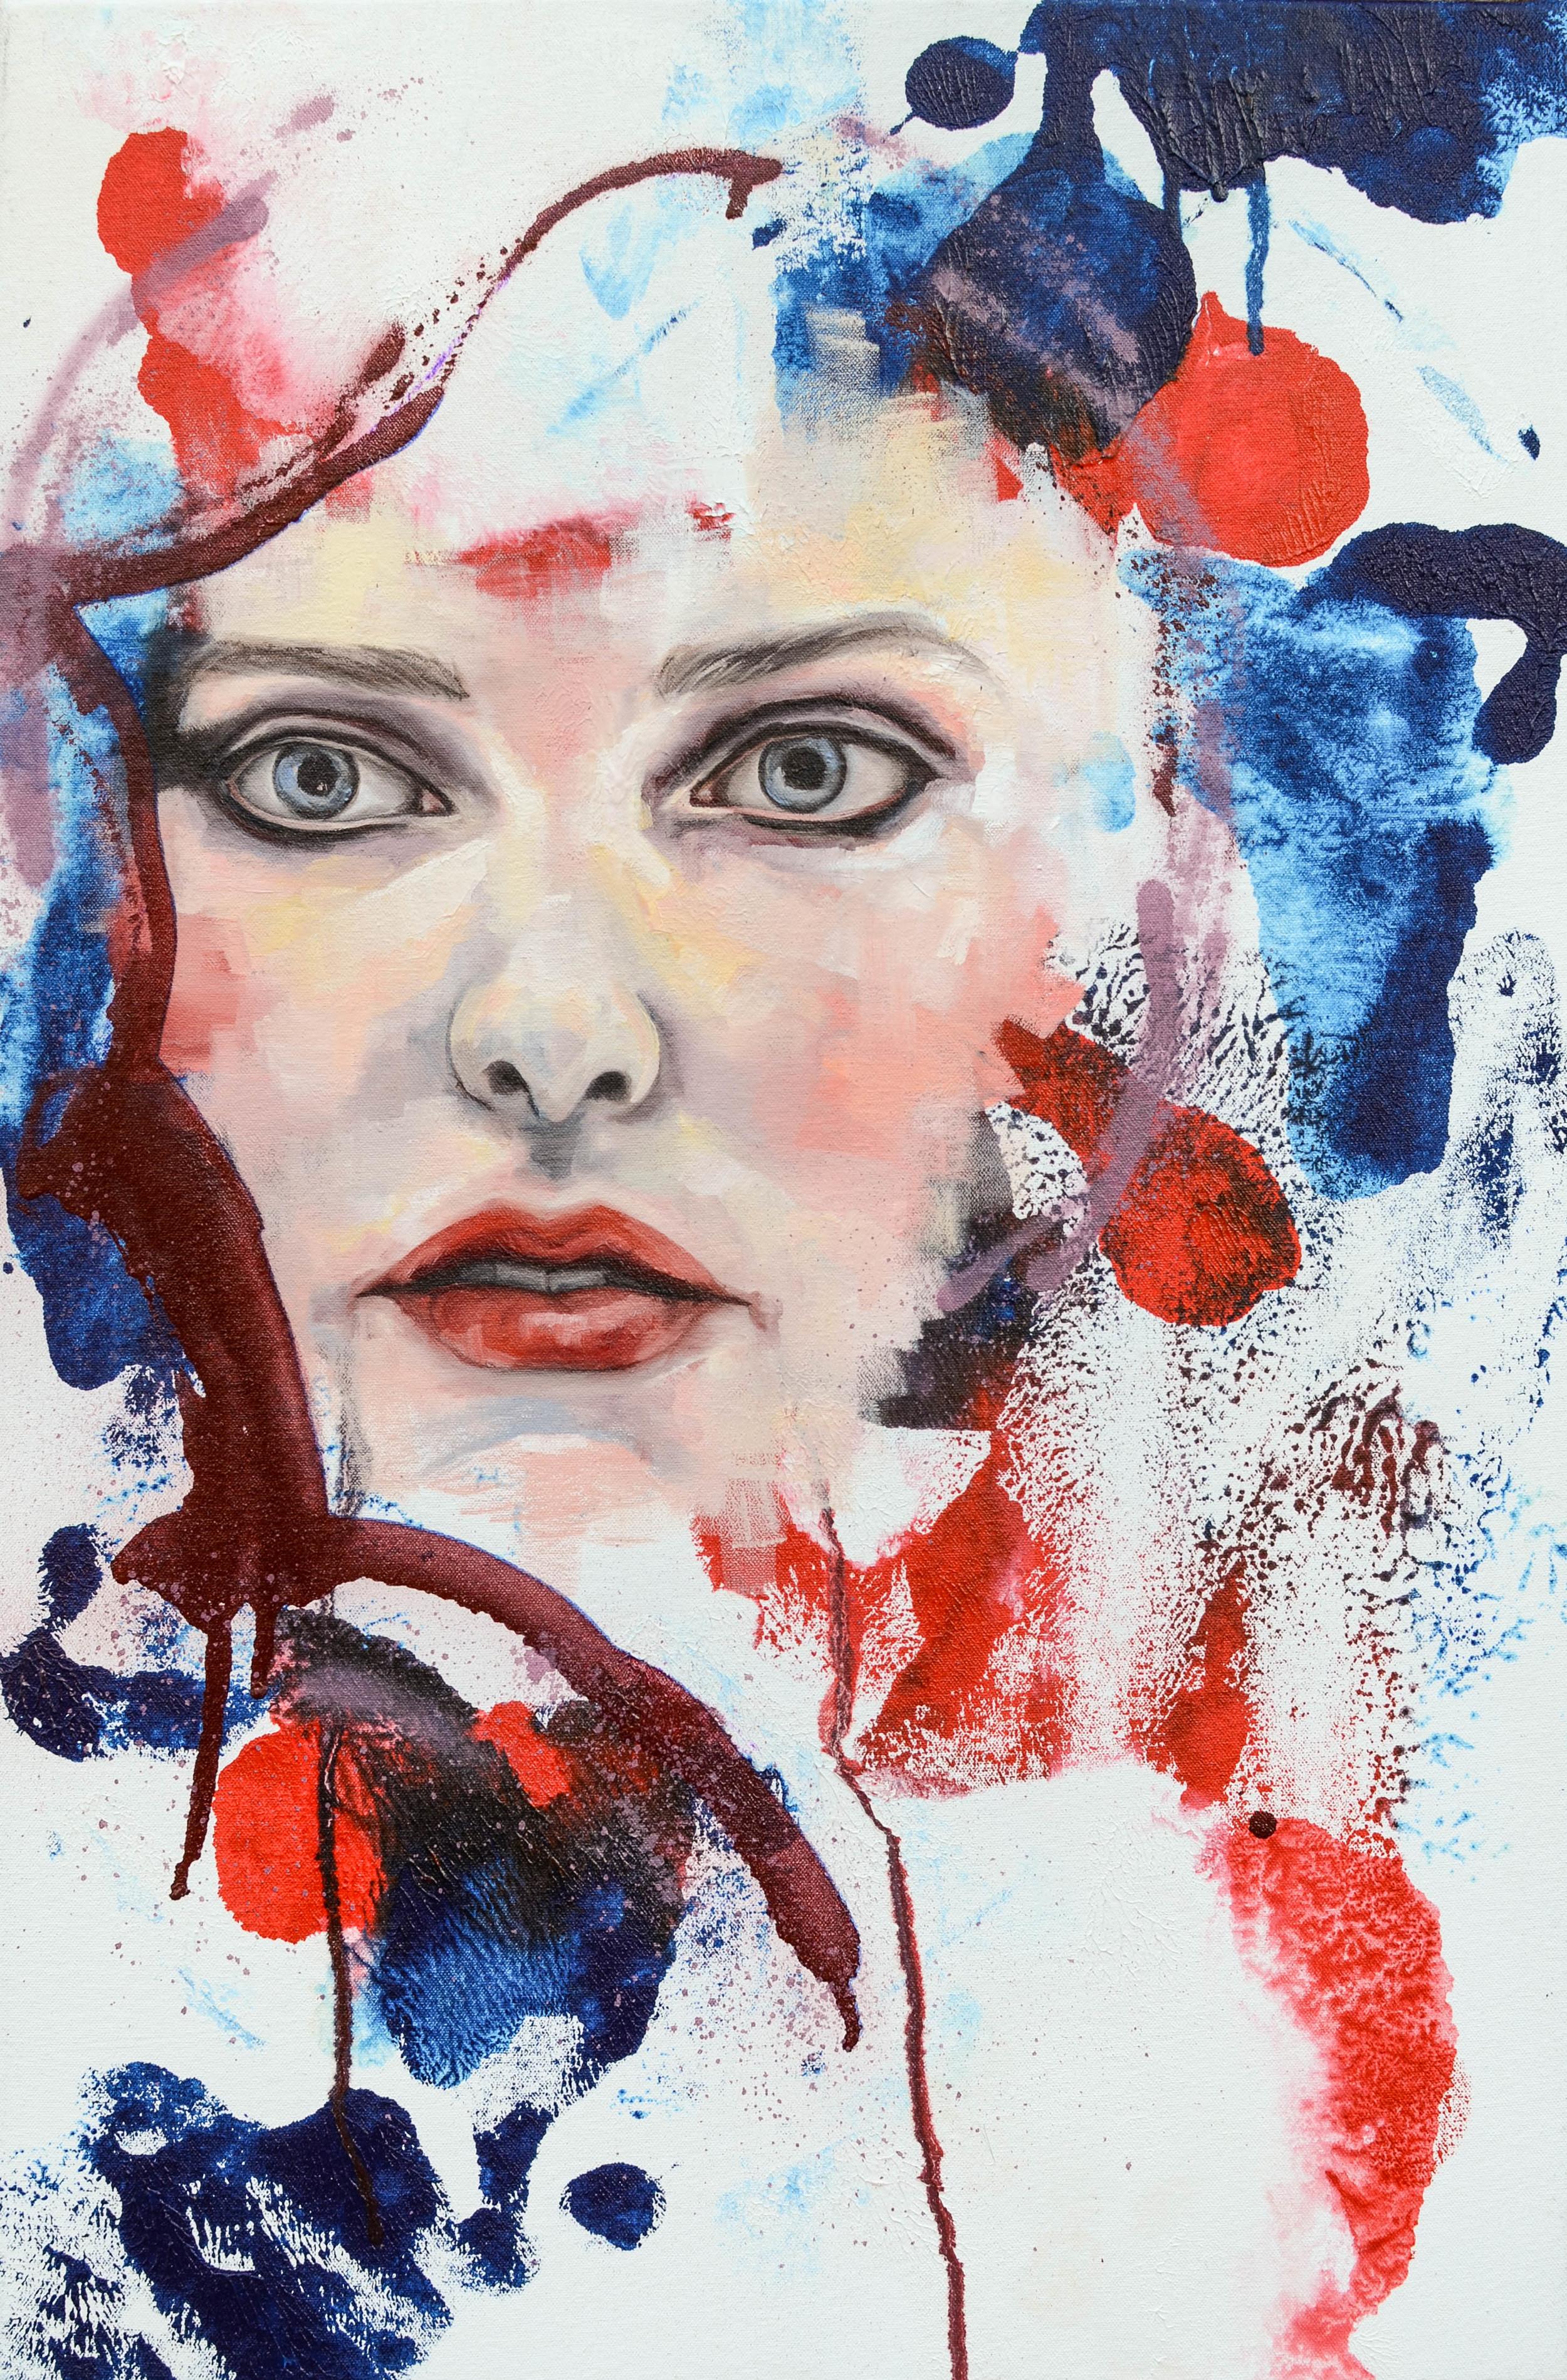 Dreamer, oil and spray enamel on canvas, 76 x 50cm